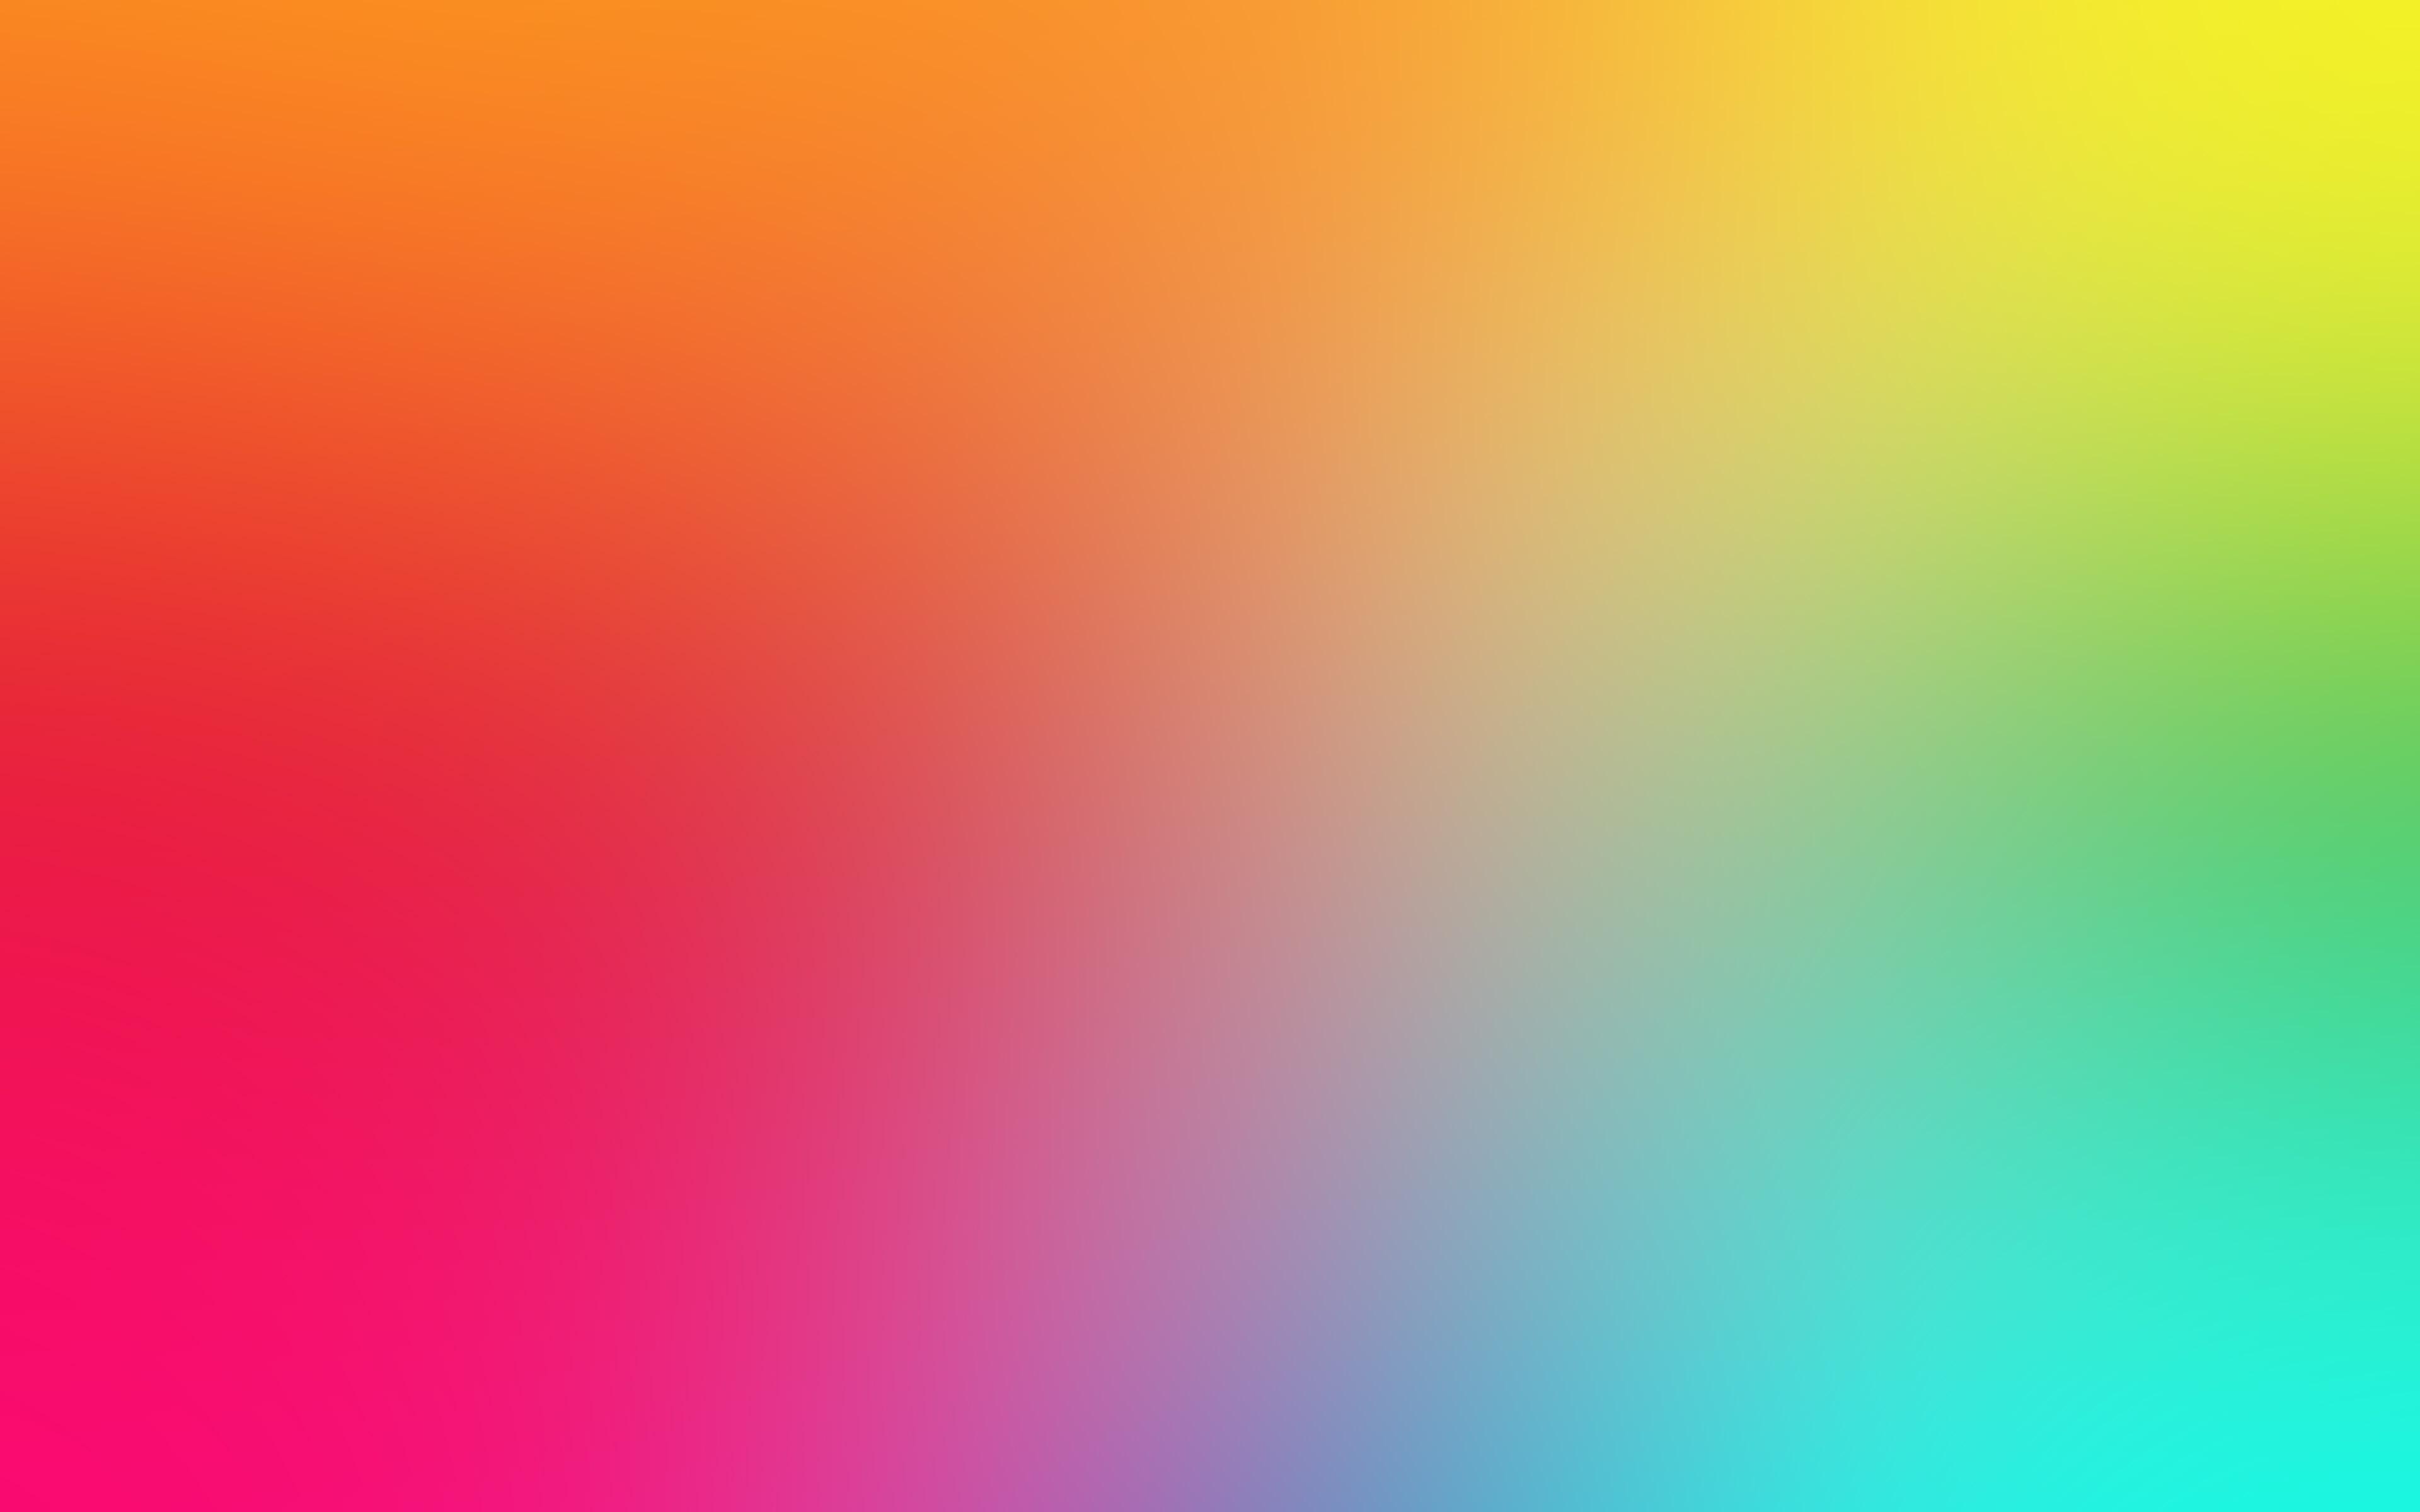 Iphone 4 Winter Wallpaper Sh70 Rainbow Color Gradation Blur Wallpaper